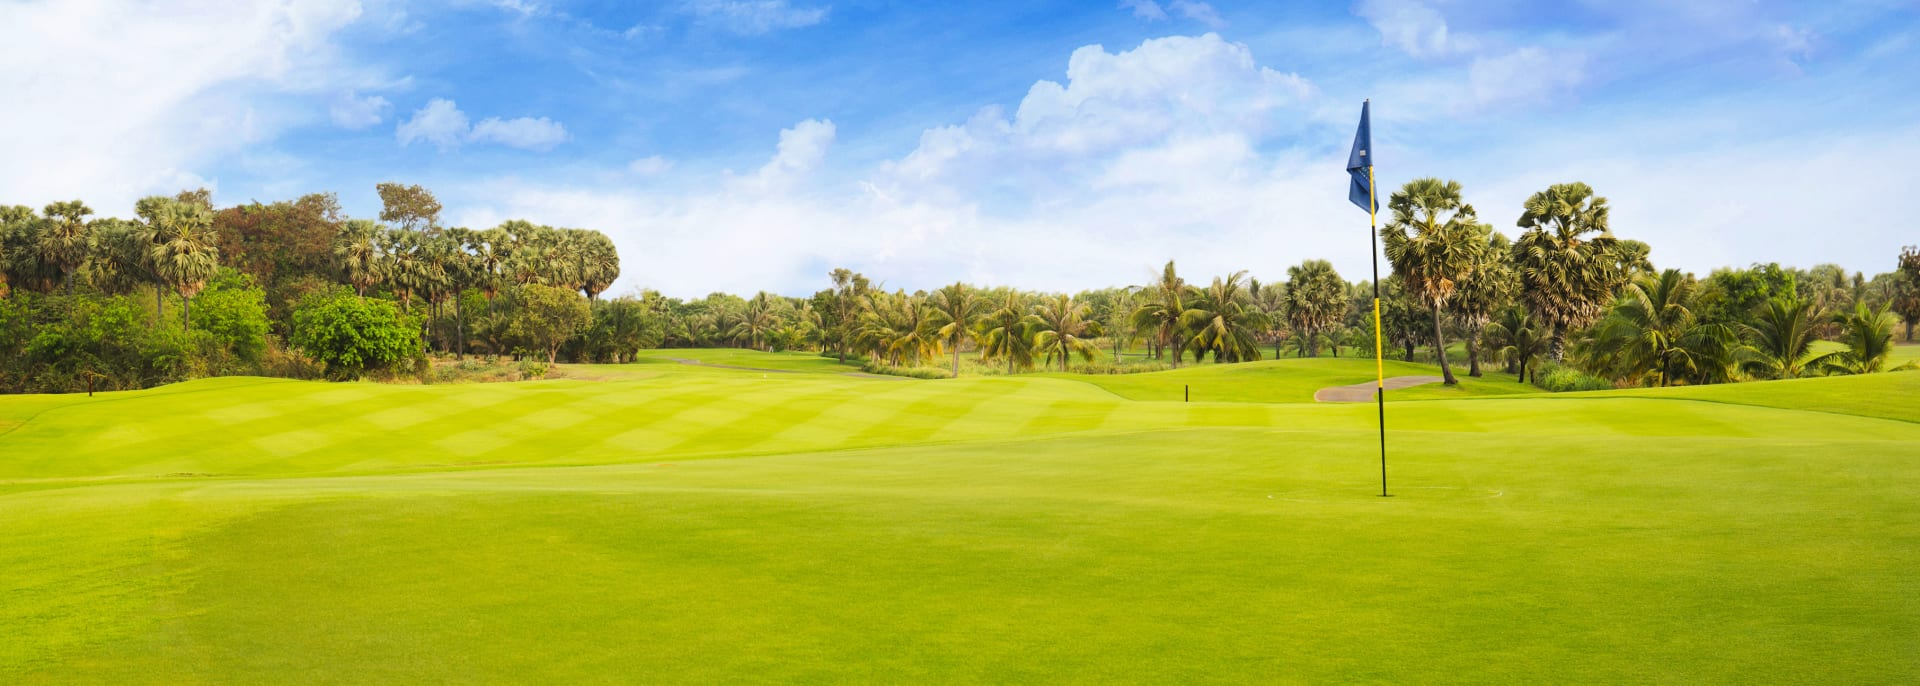 Kambodscha, Golfreisen, Knecht Reisen